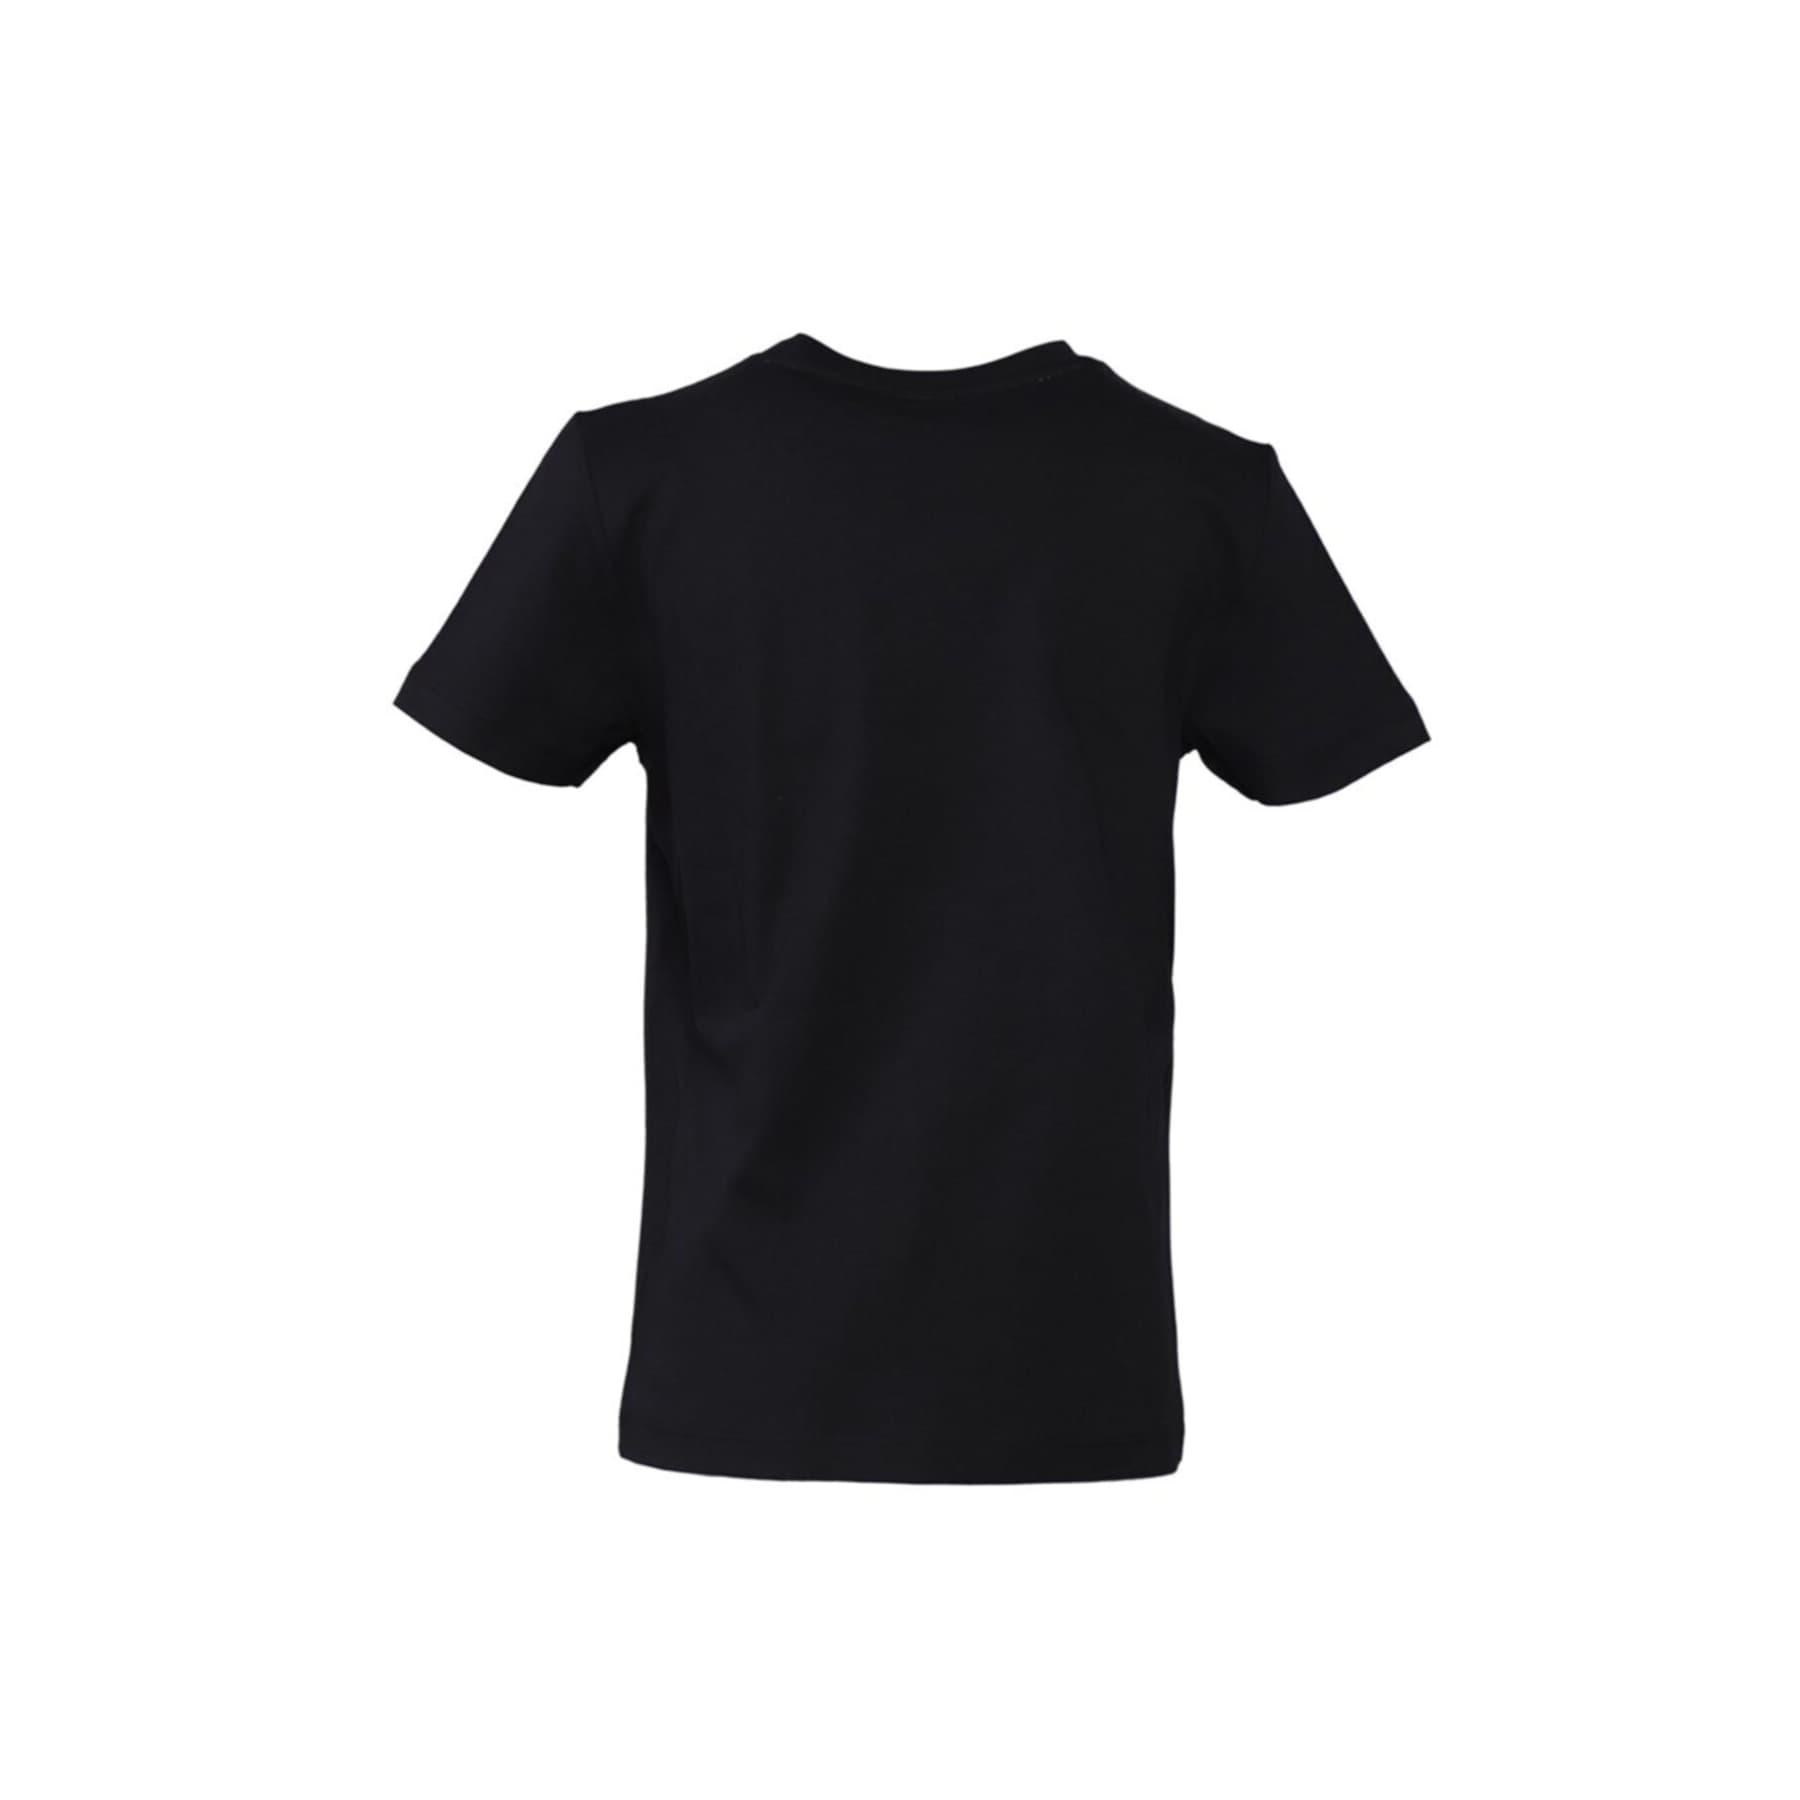 Camel Çocuk Siyah Tişört (911298-2001)